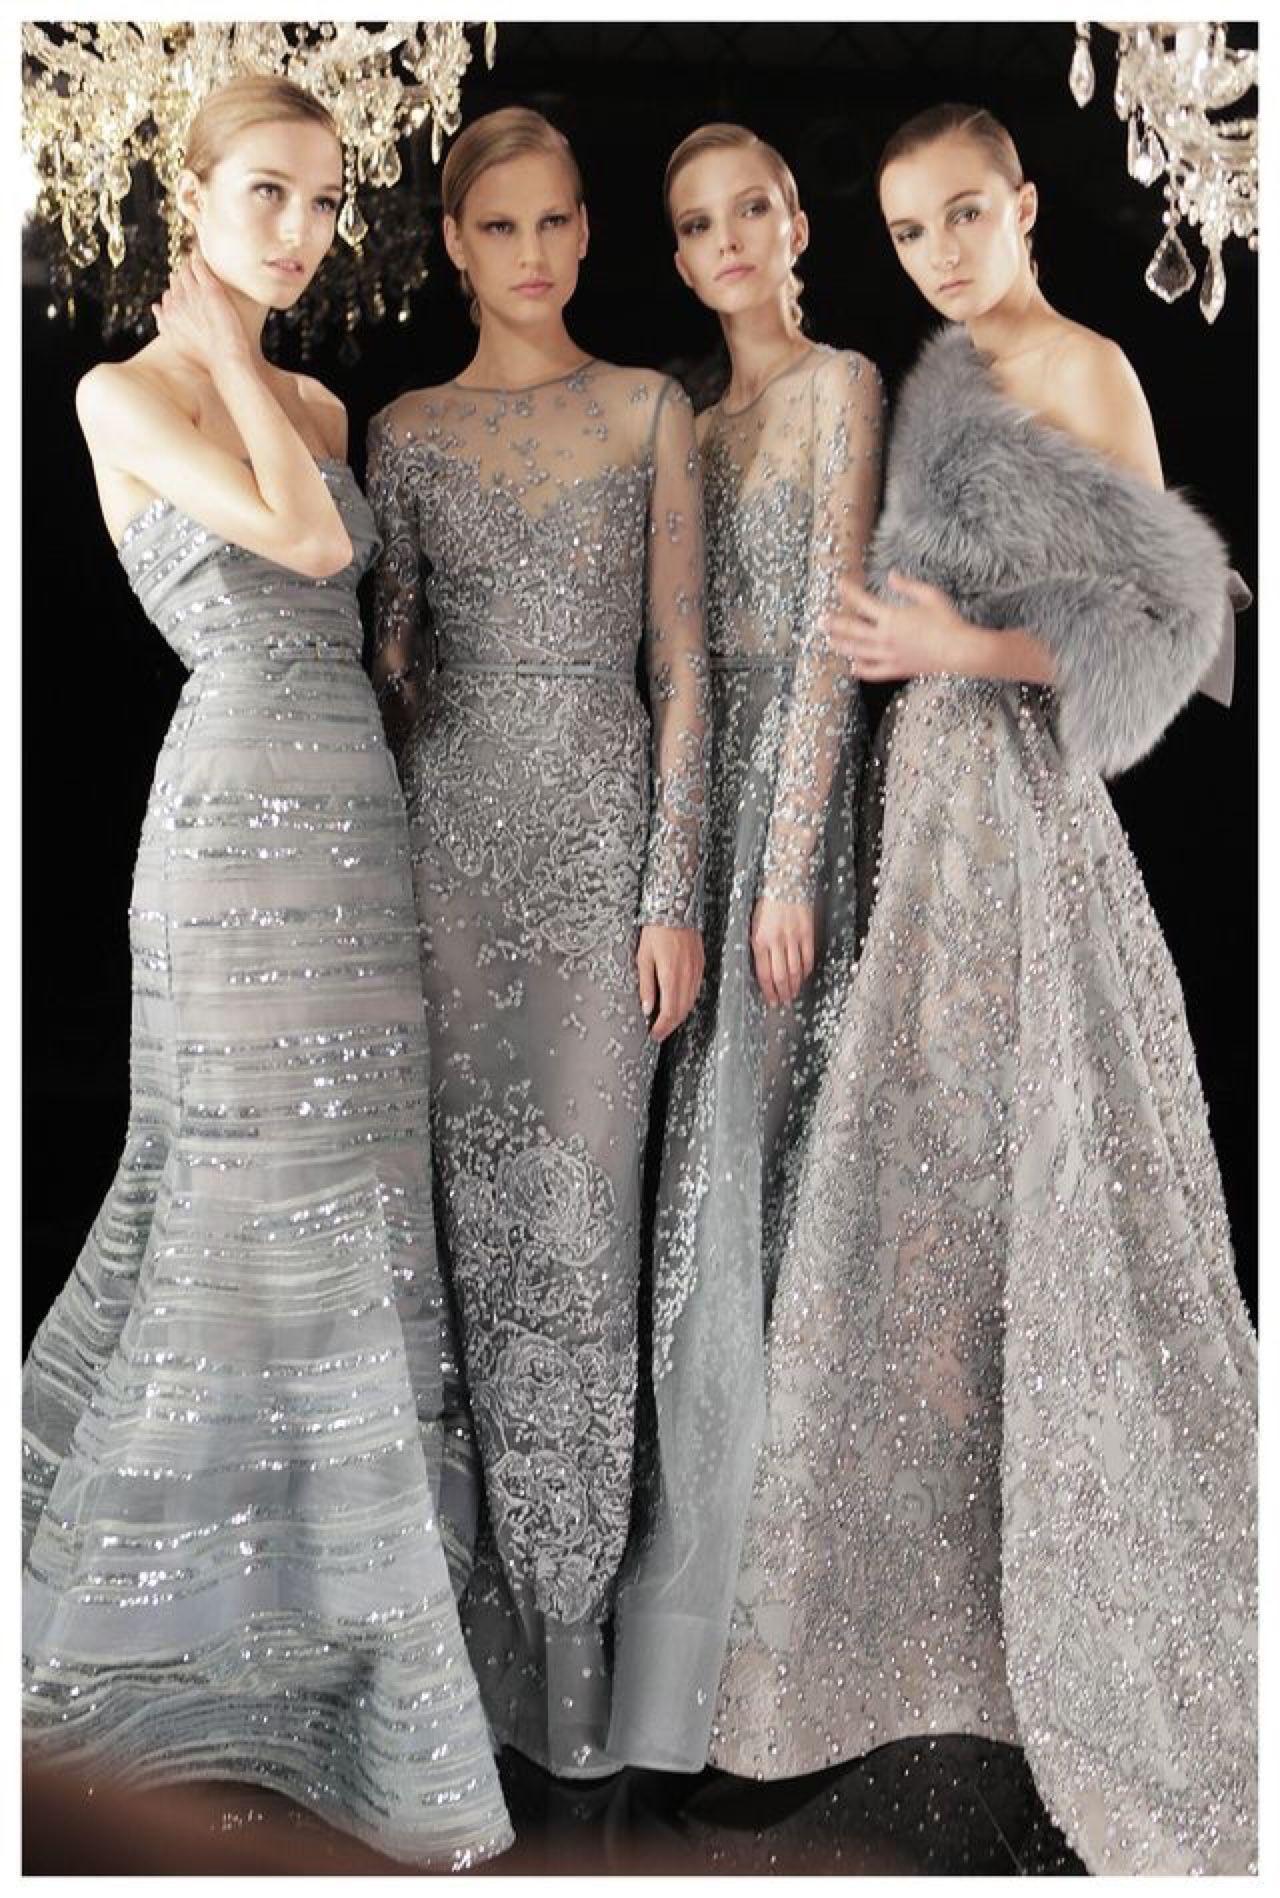 Lace dress gray  ELIE SAAB Haute Couture Fall Winter  Studio  lace dress idea